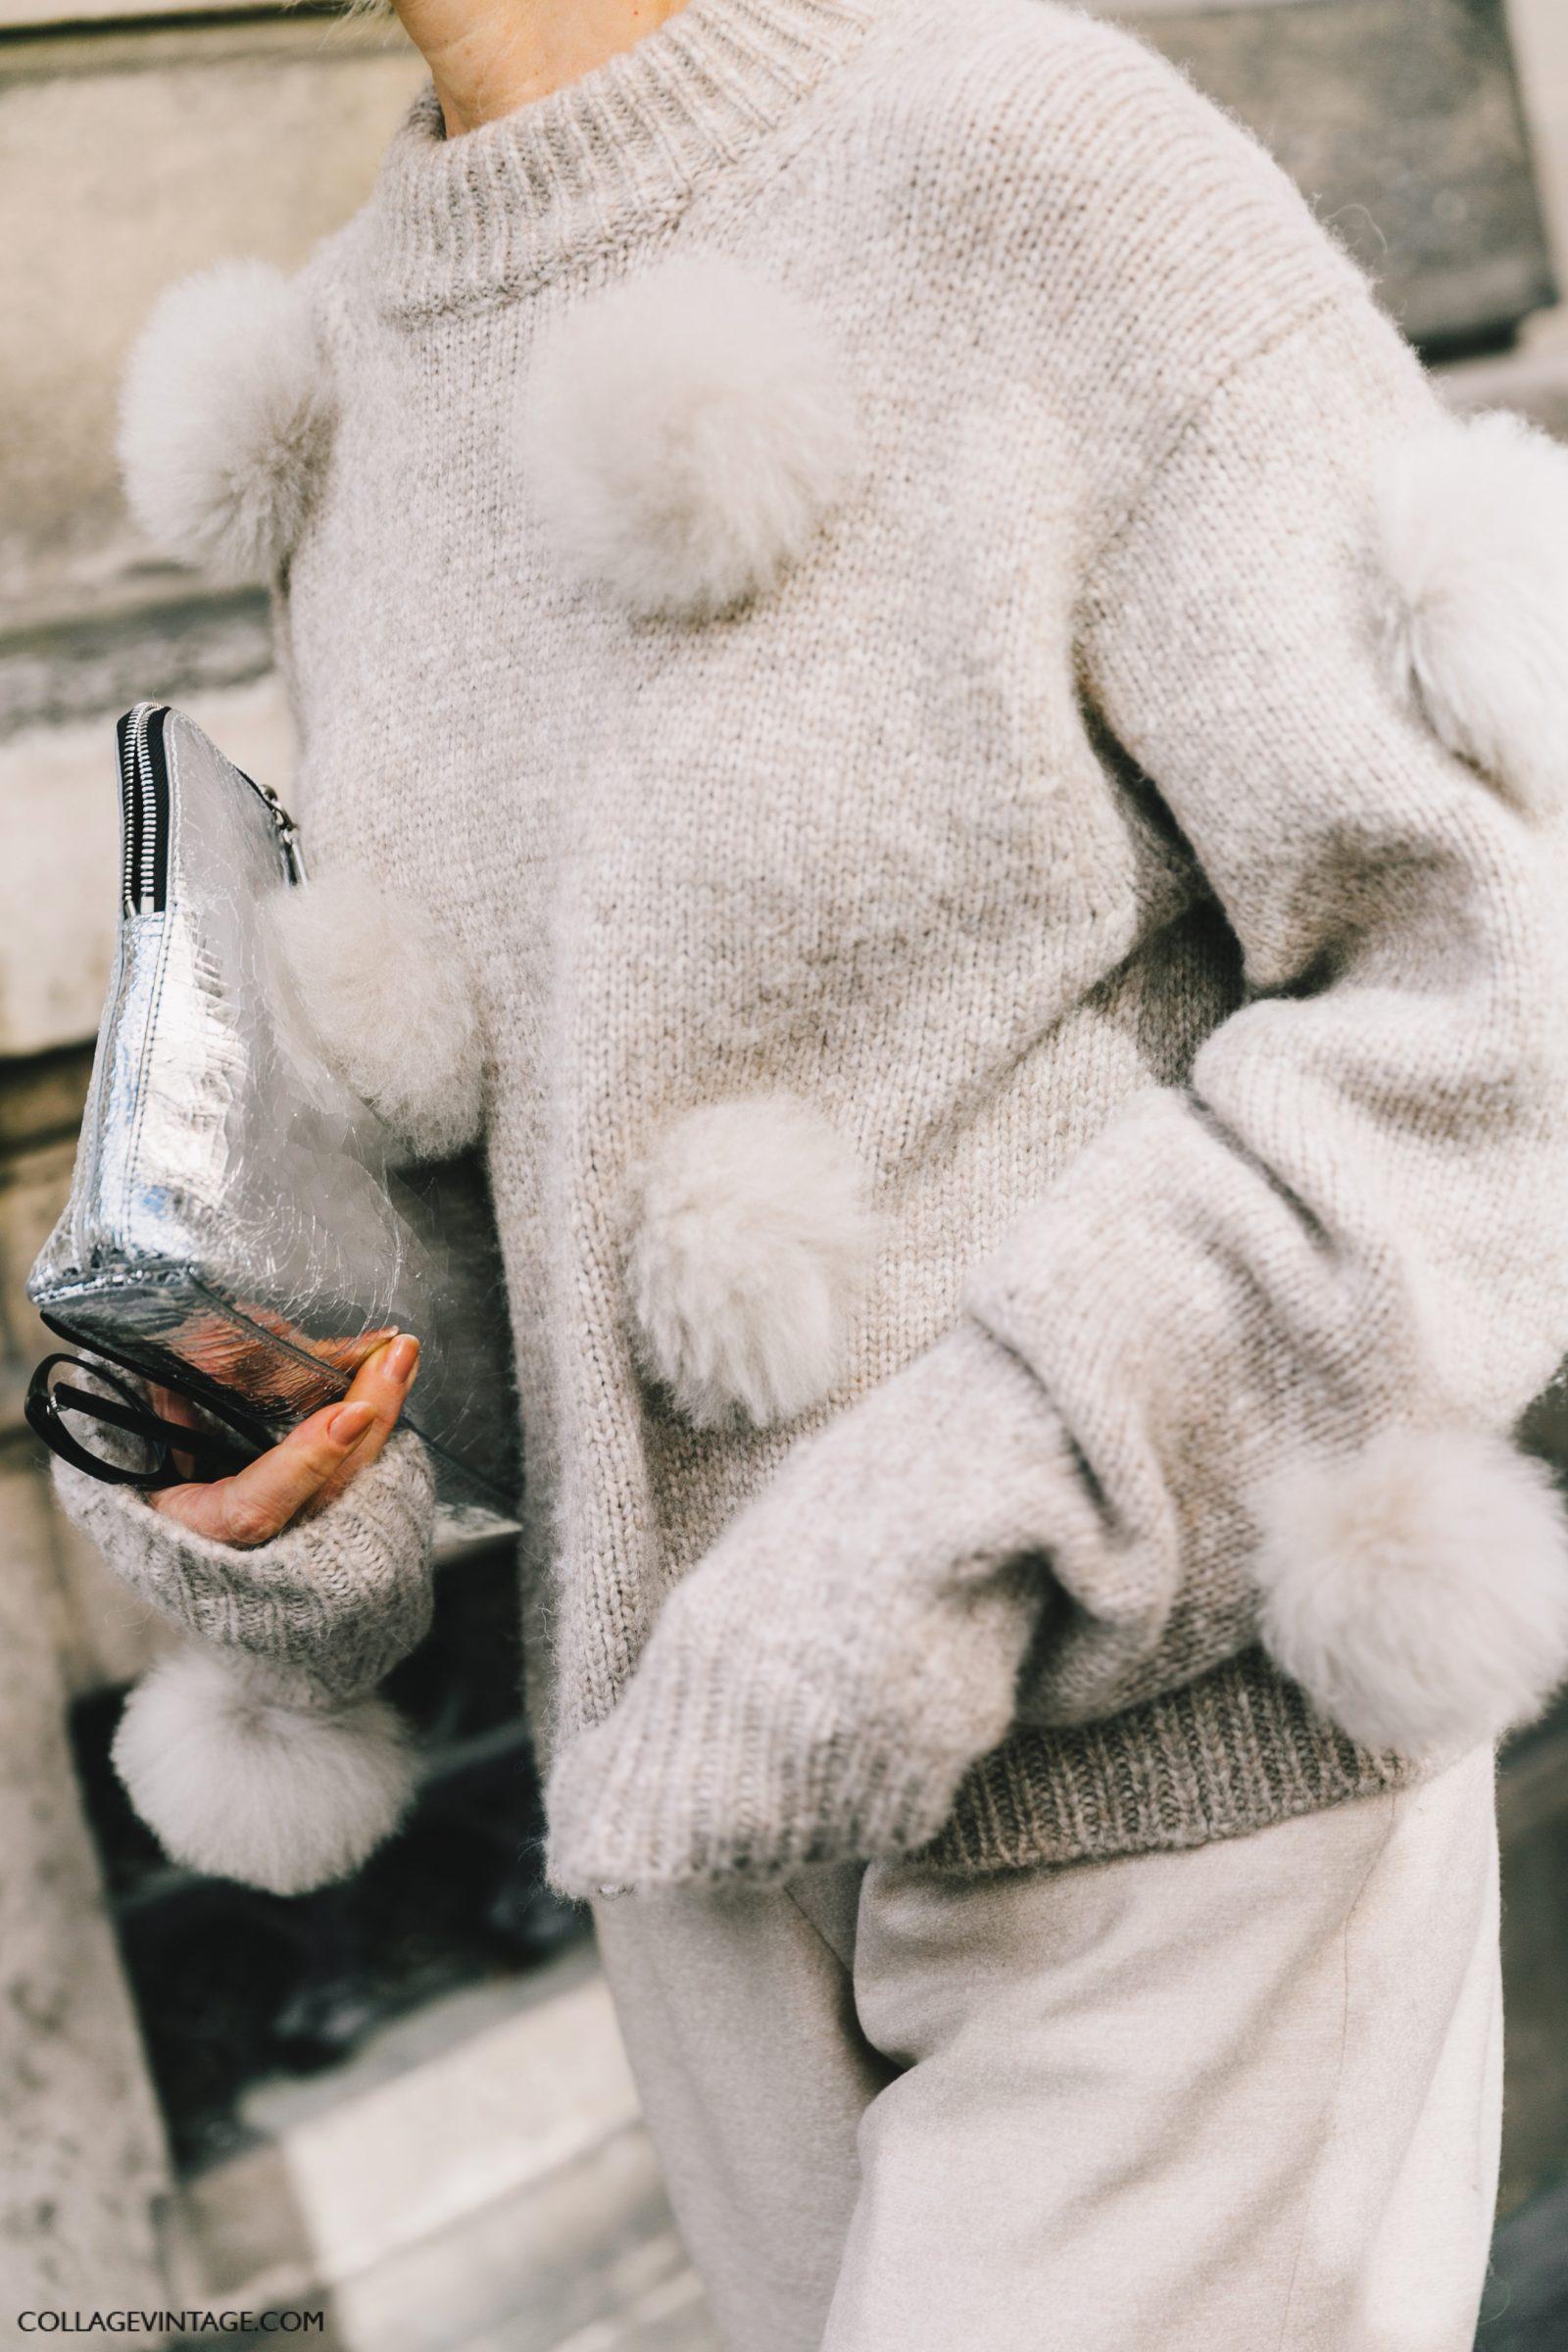 pfw-paris_fashion_week_ss17-street_style-outfits-collage_vintage-valentino-balenciaga-celine-134